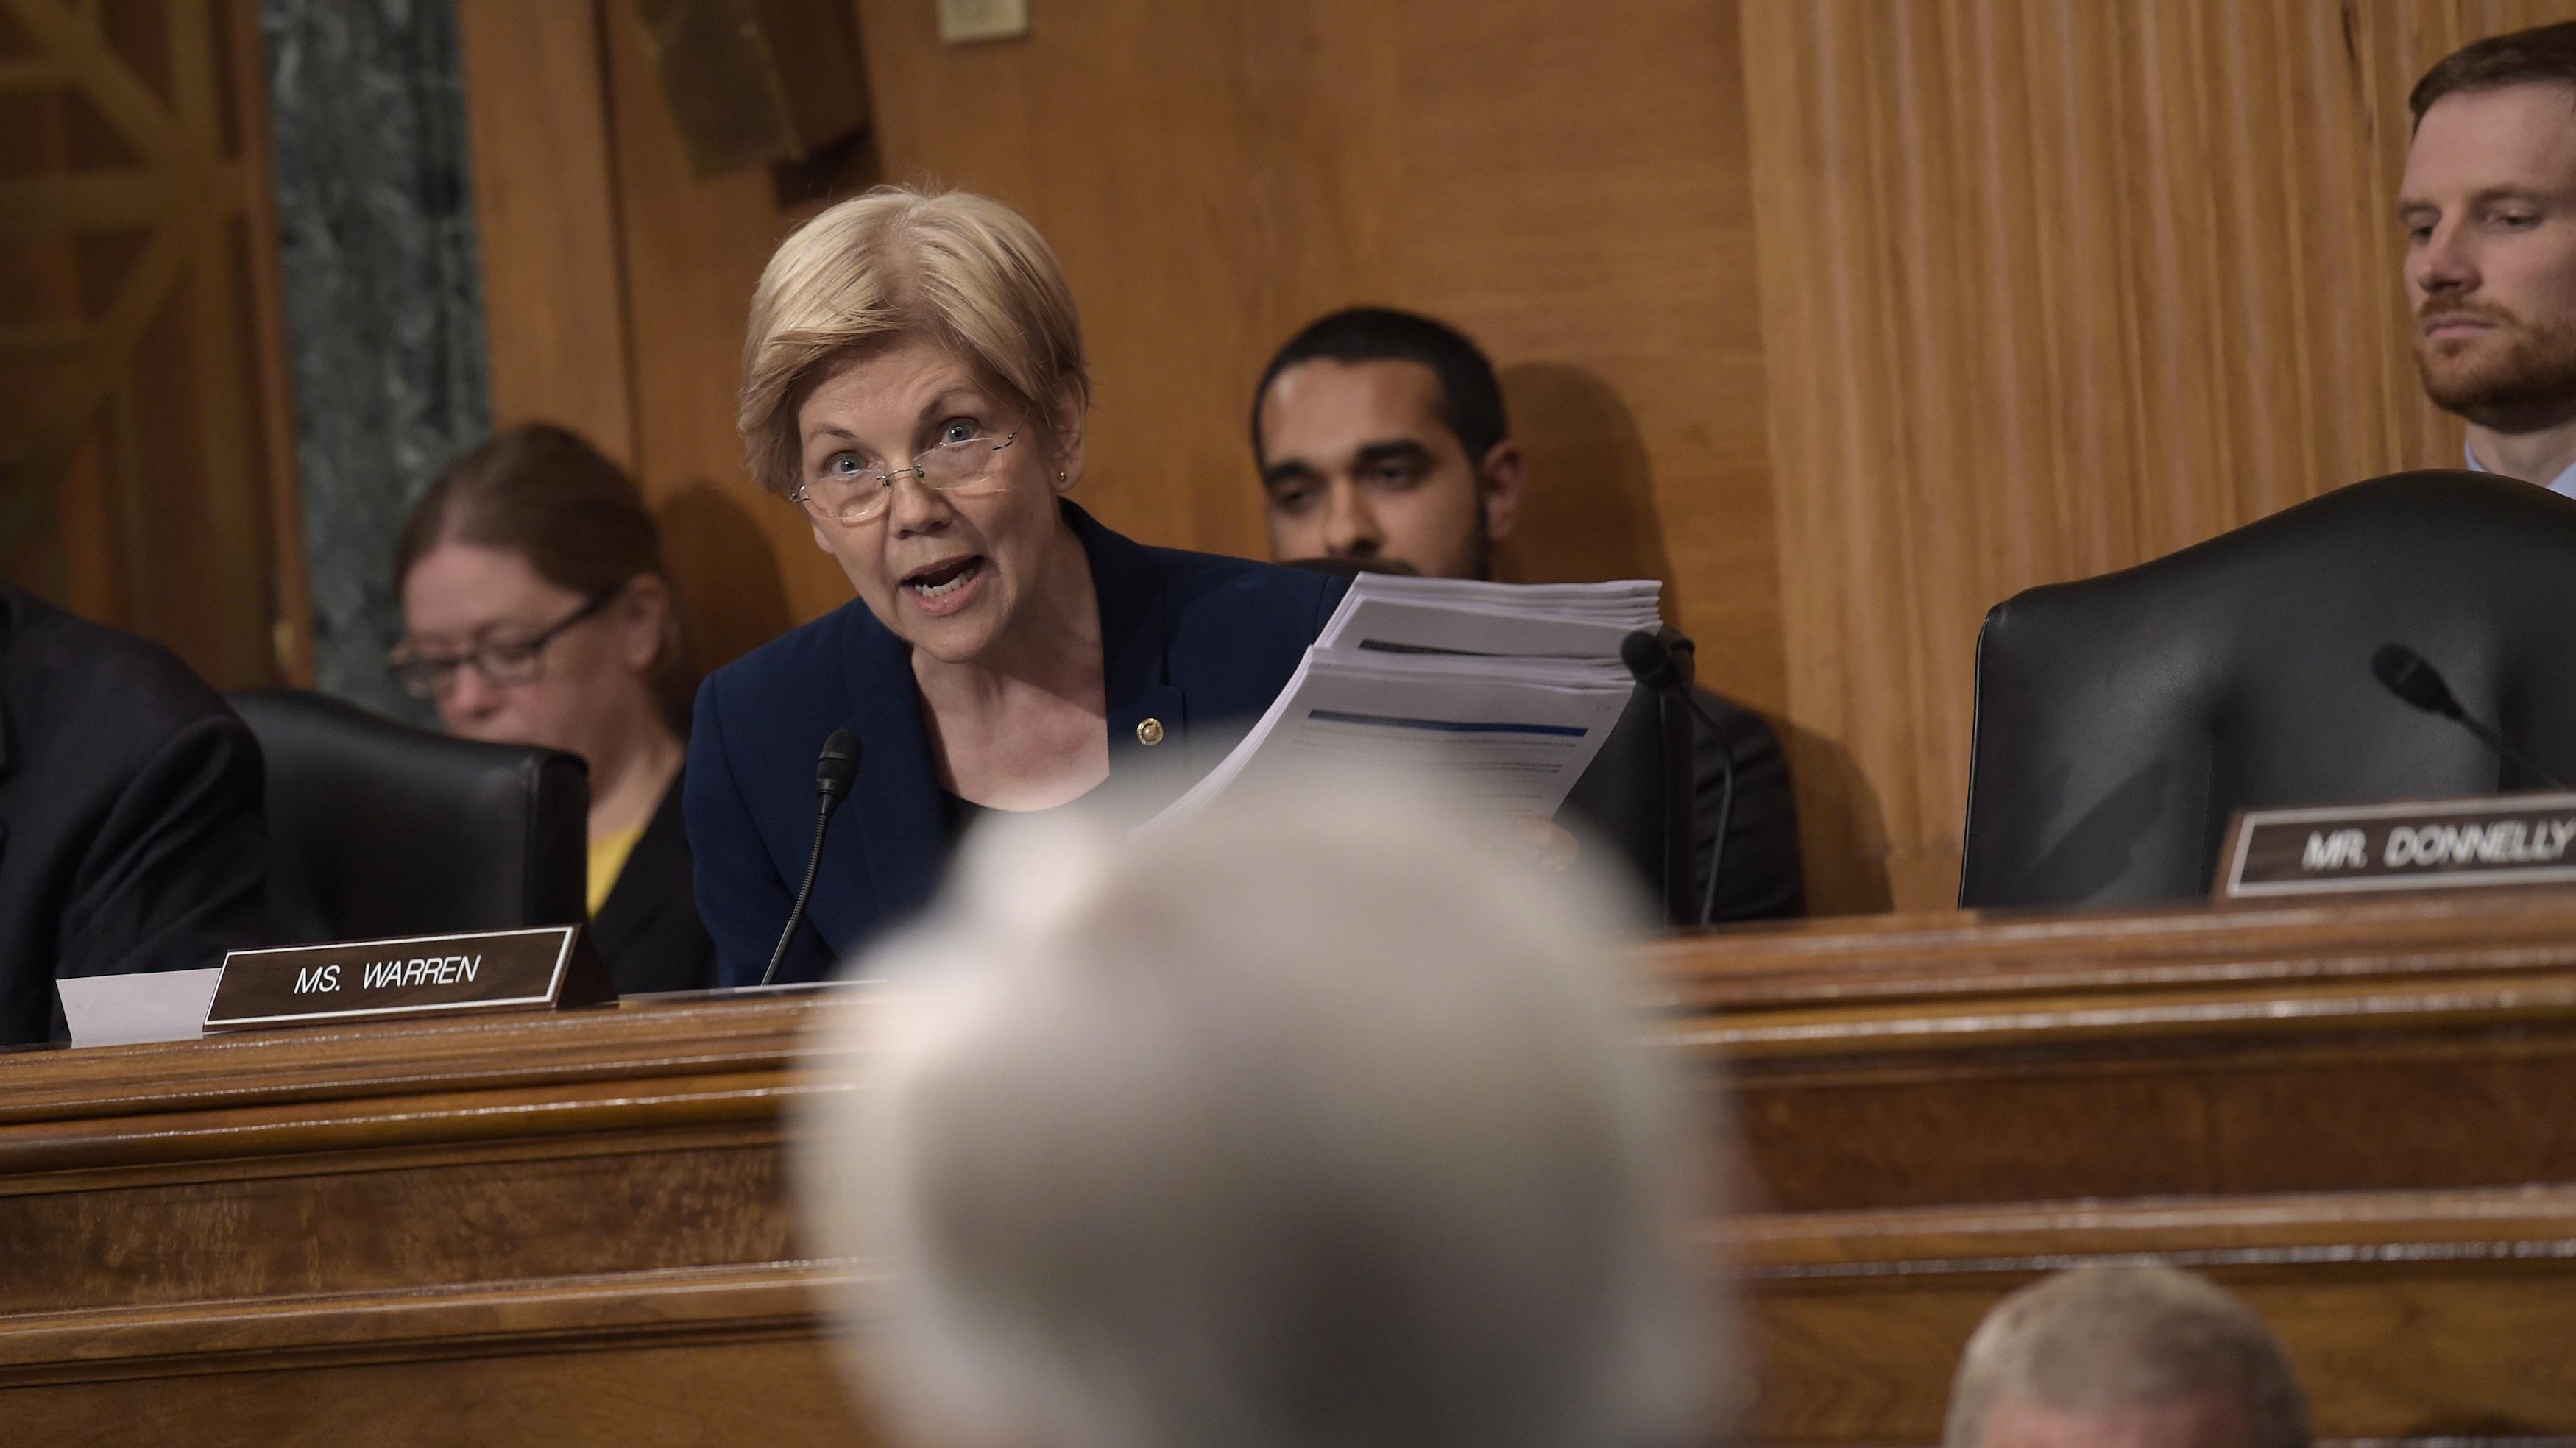 Senator Warren addresses Wells Fargo CEO John Stumpf during a hearing for the Senate Banking Committee in Washington, DC.